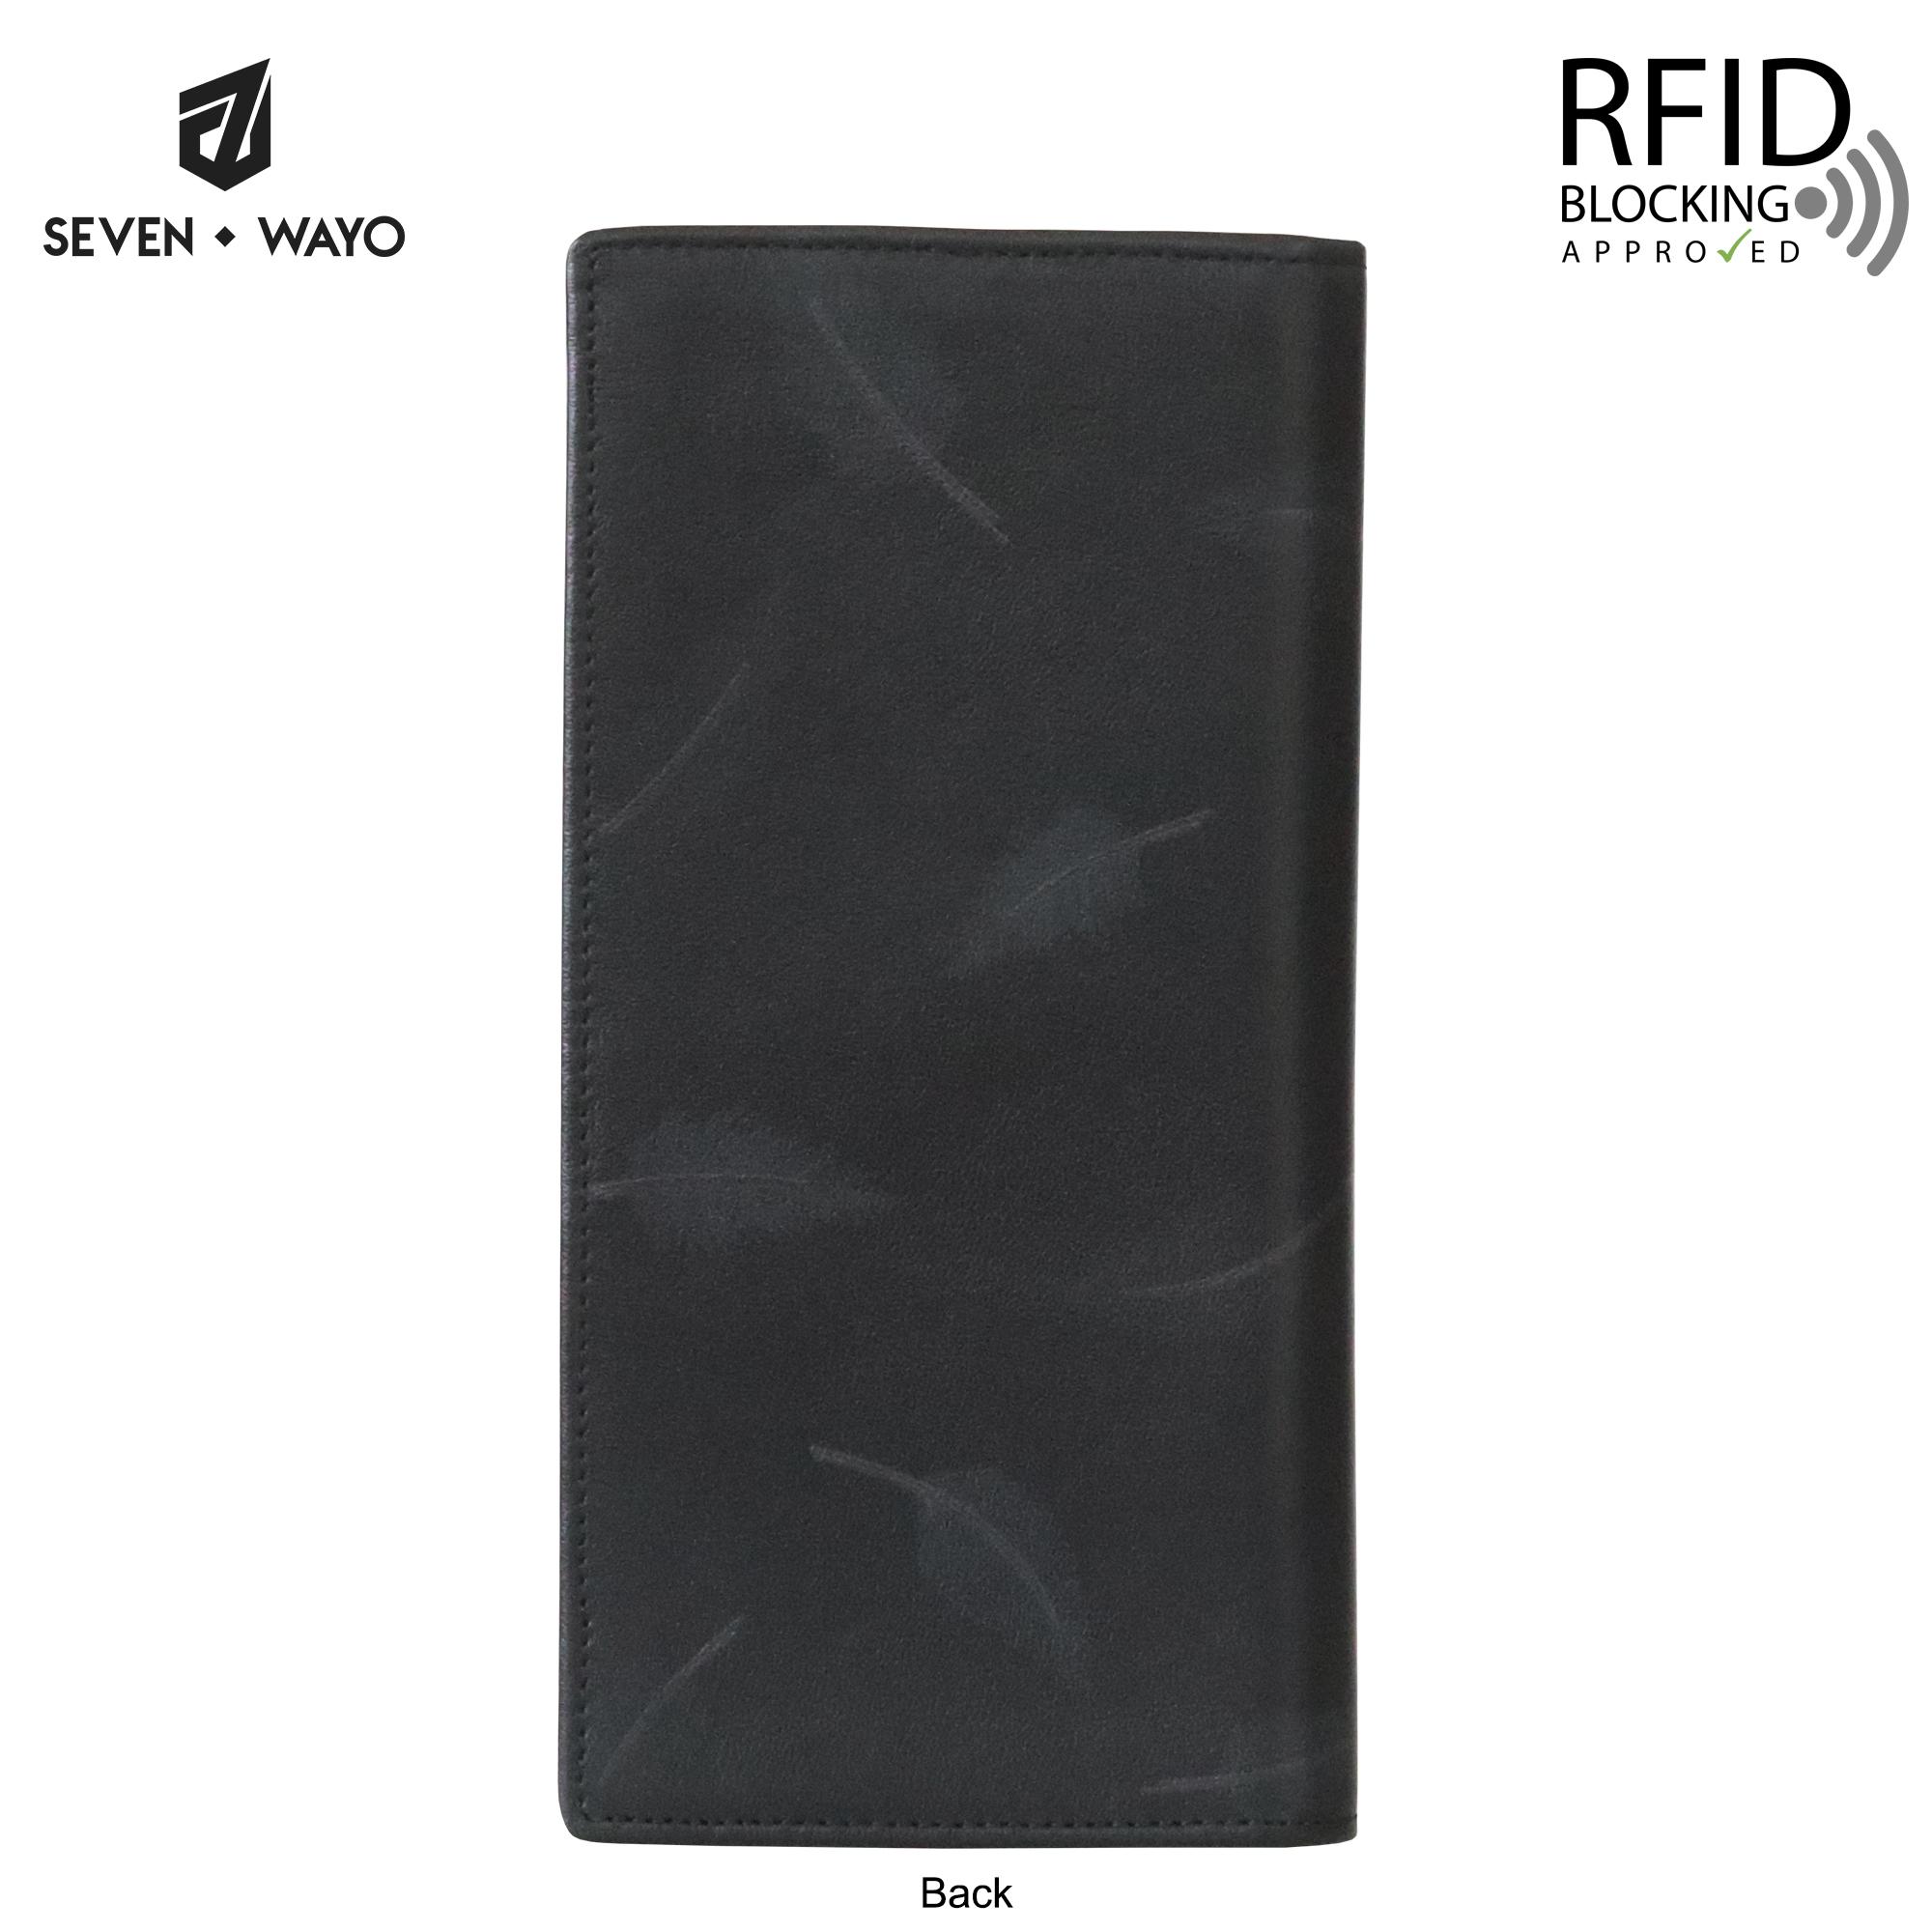 SEVEN WAYO กระเป๋าสตางค์ผู้ชายหนังแท้ RFID Blocking กระเป๋าสตางค์ใบยาว สีดำ แพทเทิร์นขนนก กระเป๋าเงิน กระเป๋าถือ SW03-F